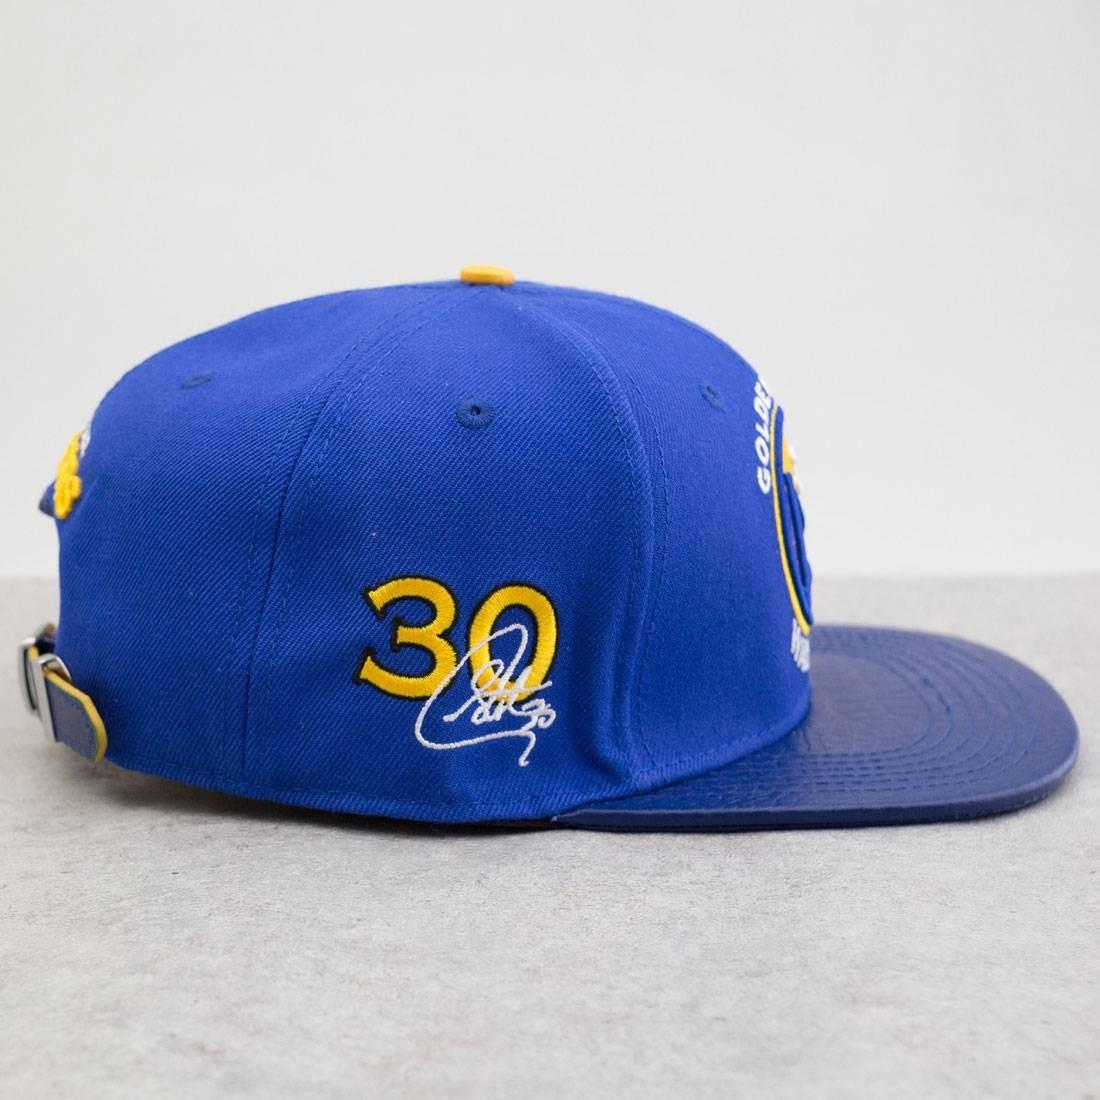 b5383a2875d Pro Standard x NBA Golden State Warriors Leather Brim Hat (blue   royal)